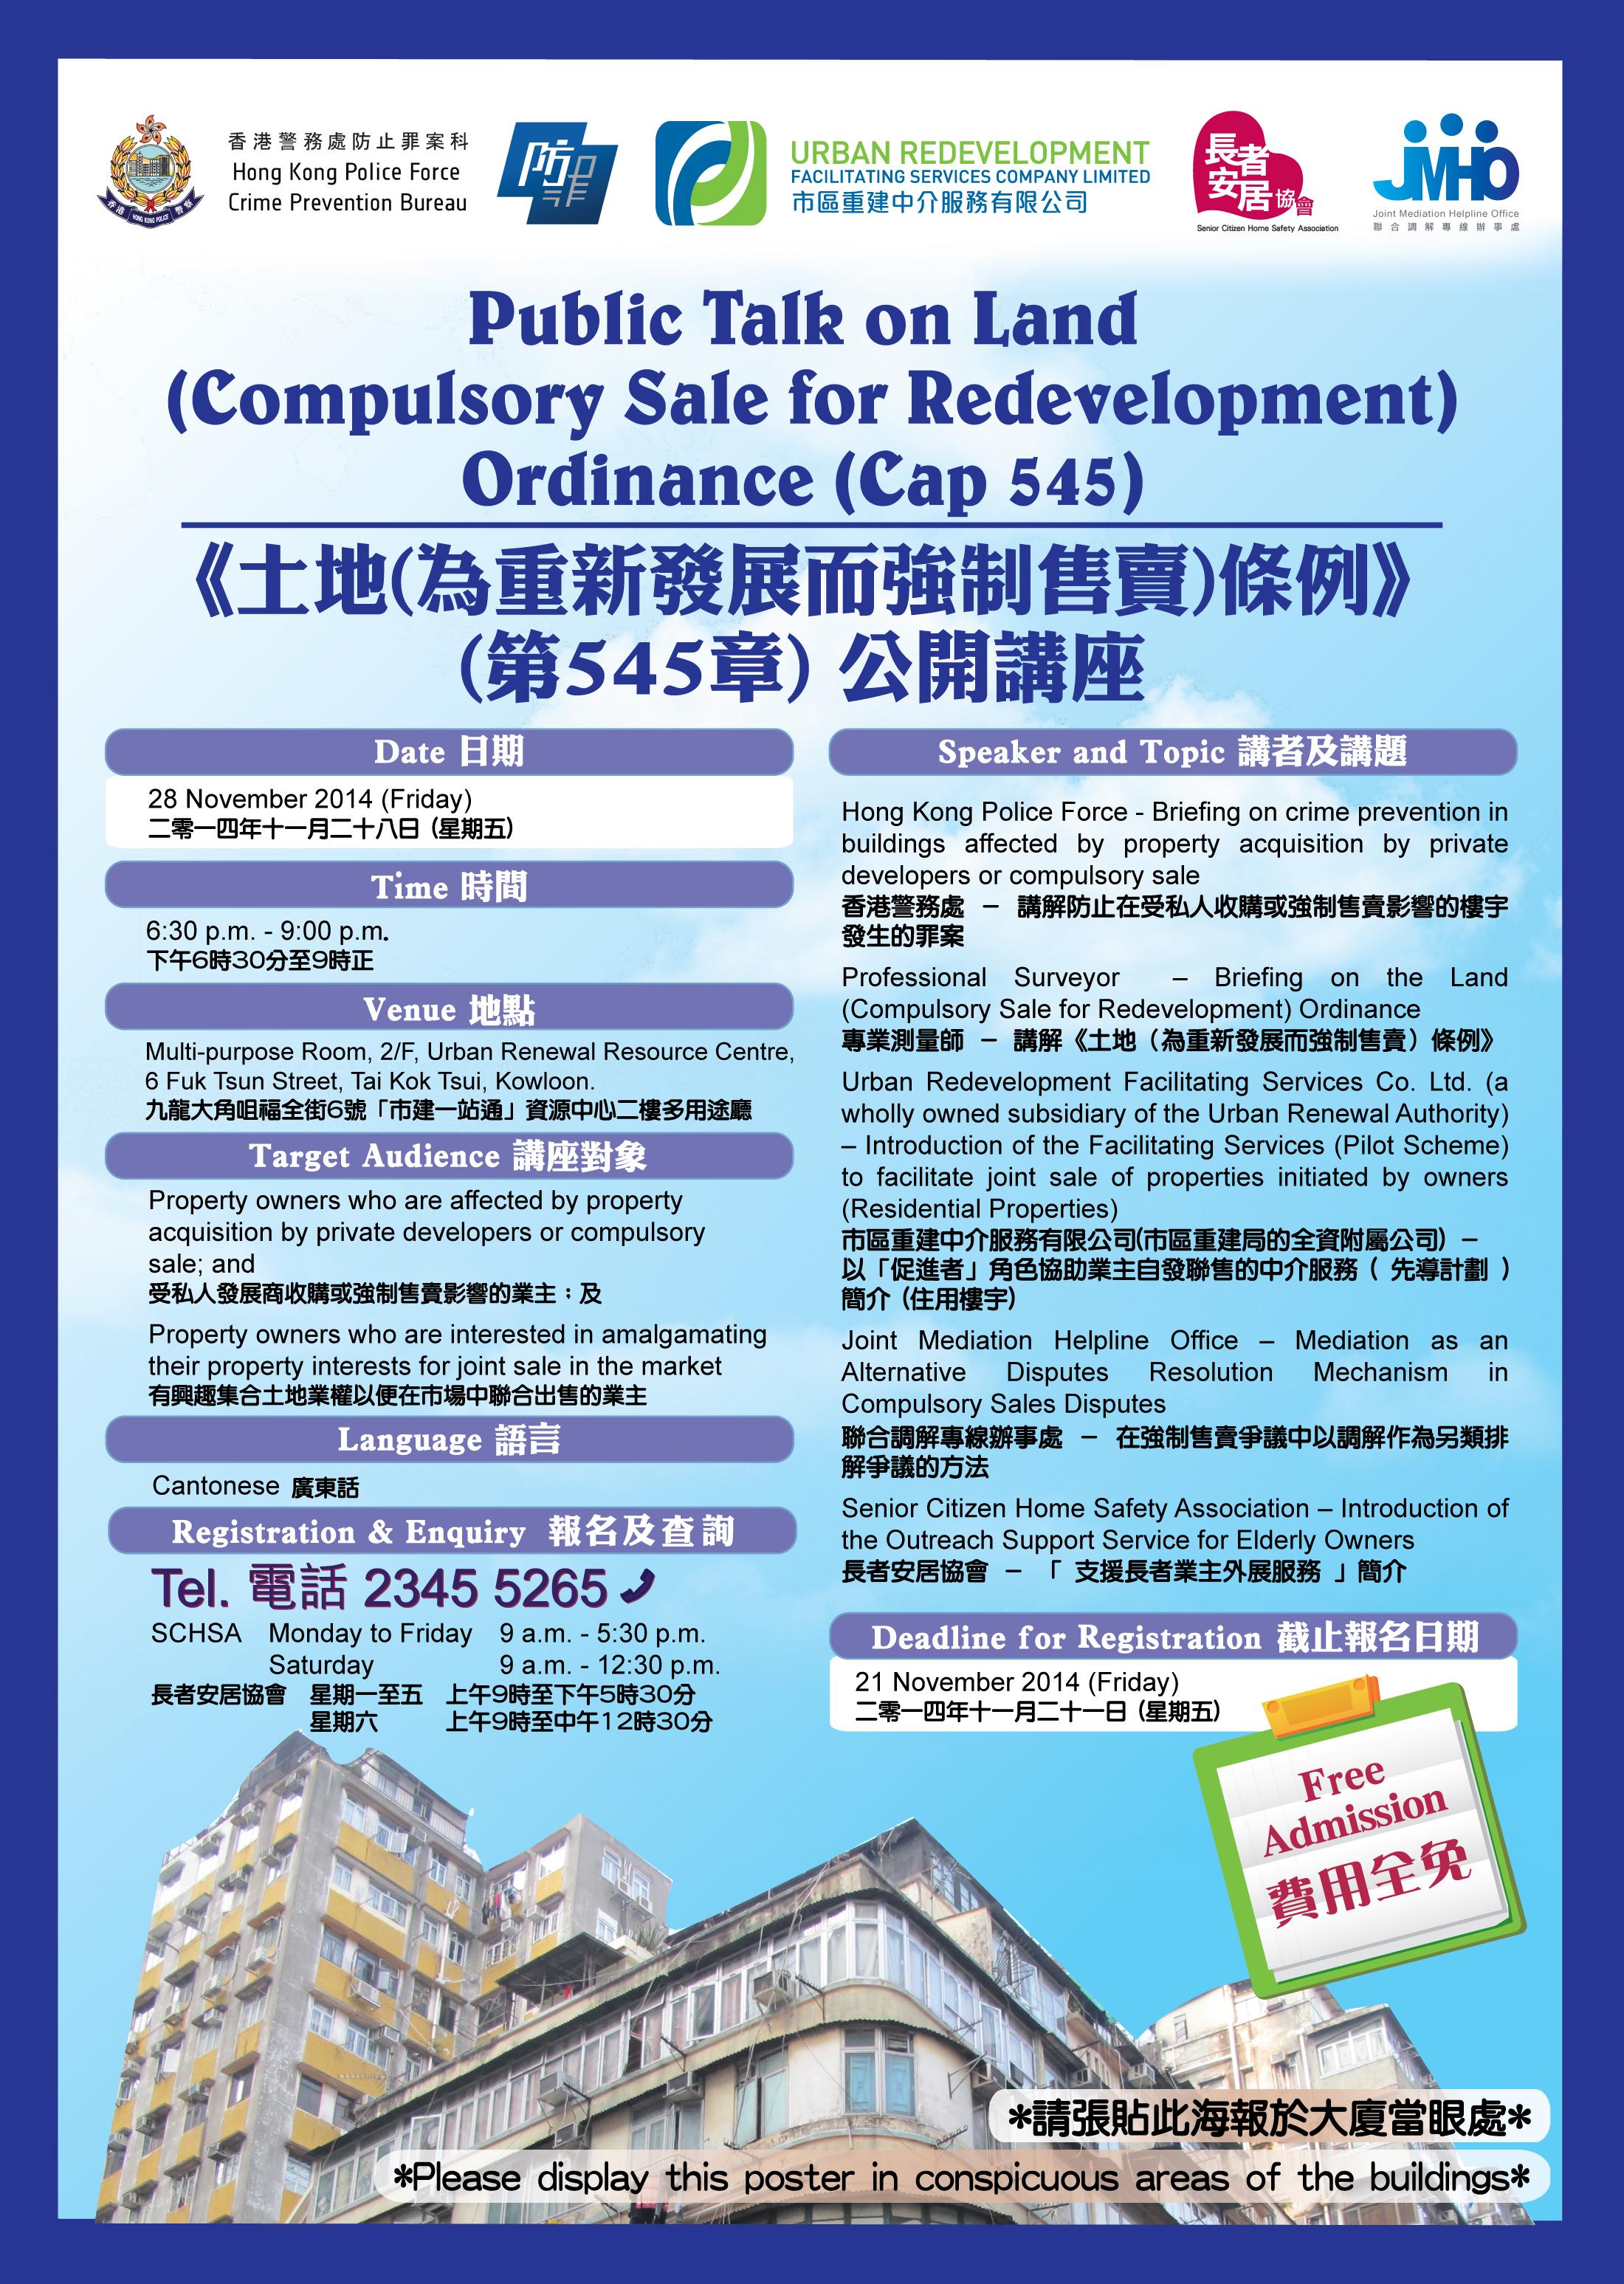 28 Nov 2014, Public Talk on Land (Compulsory Sale for Redevelopment)  Ordinance (Cap 545)